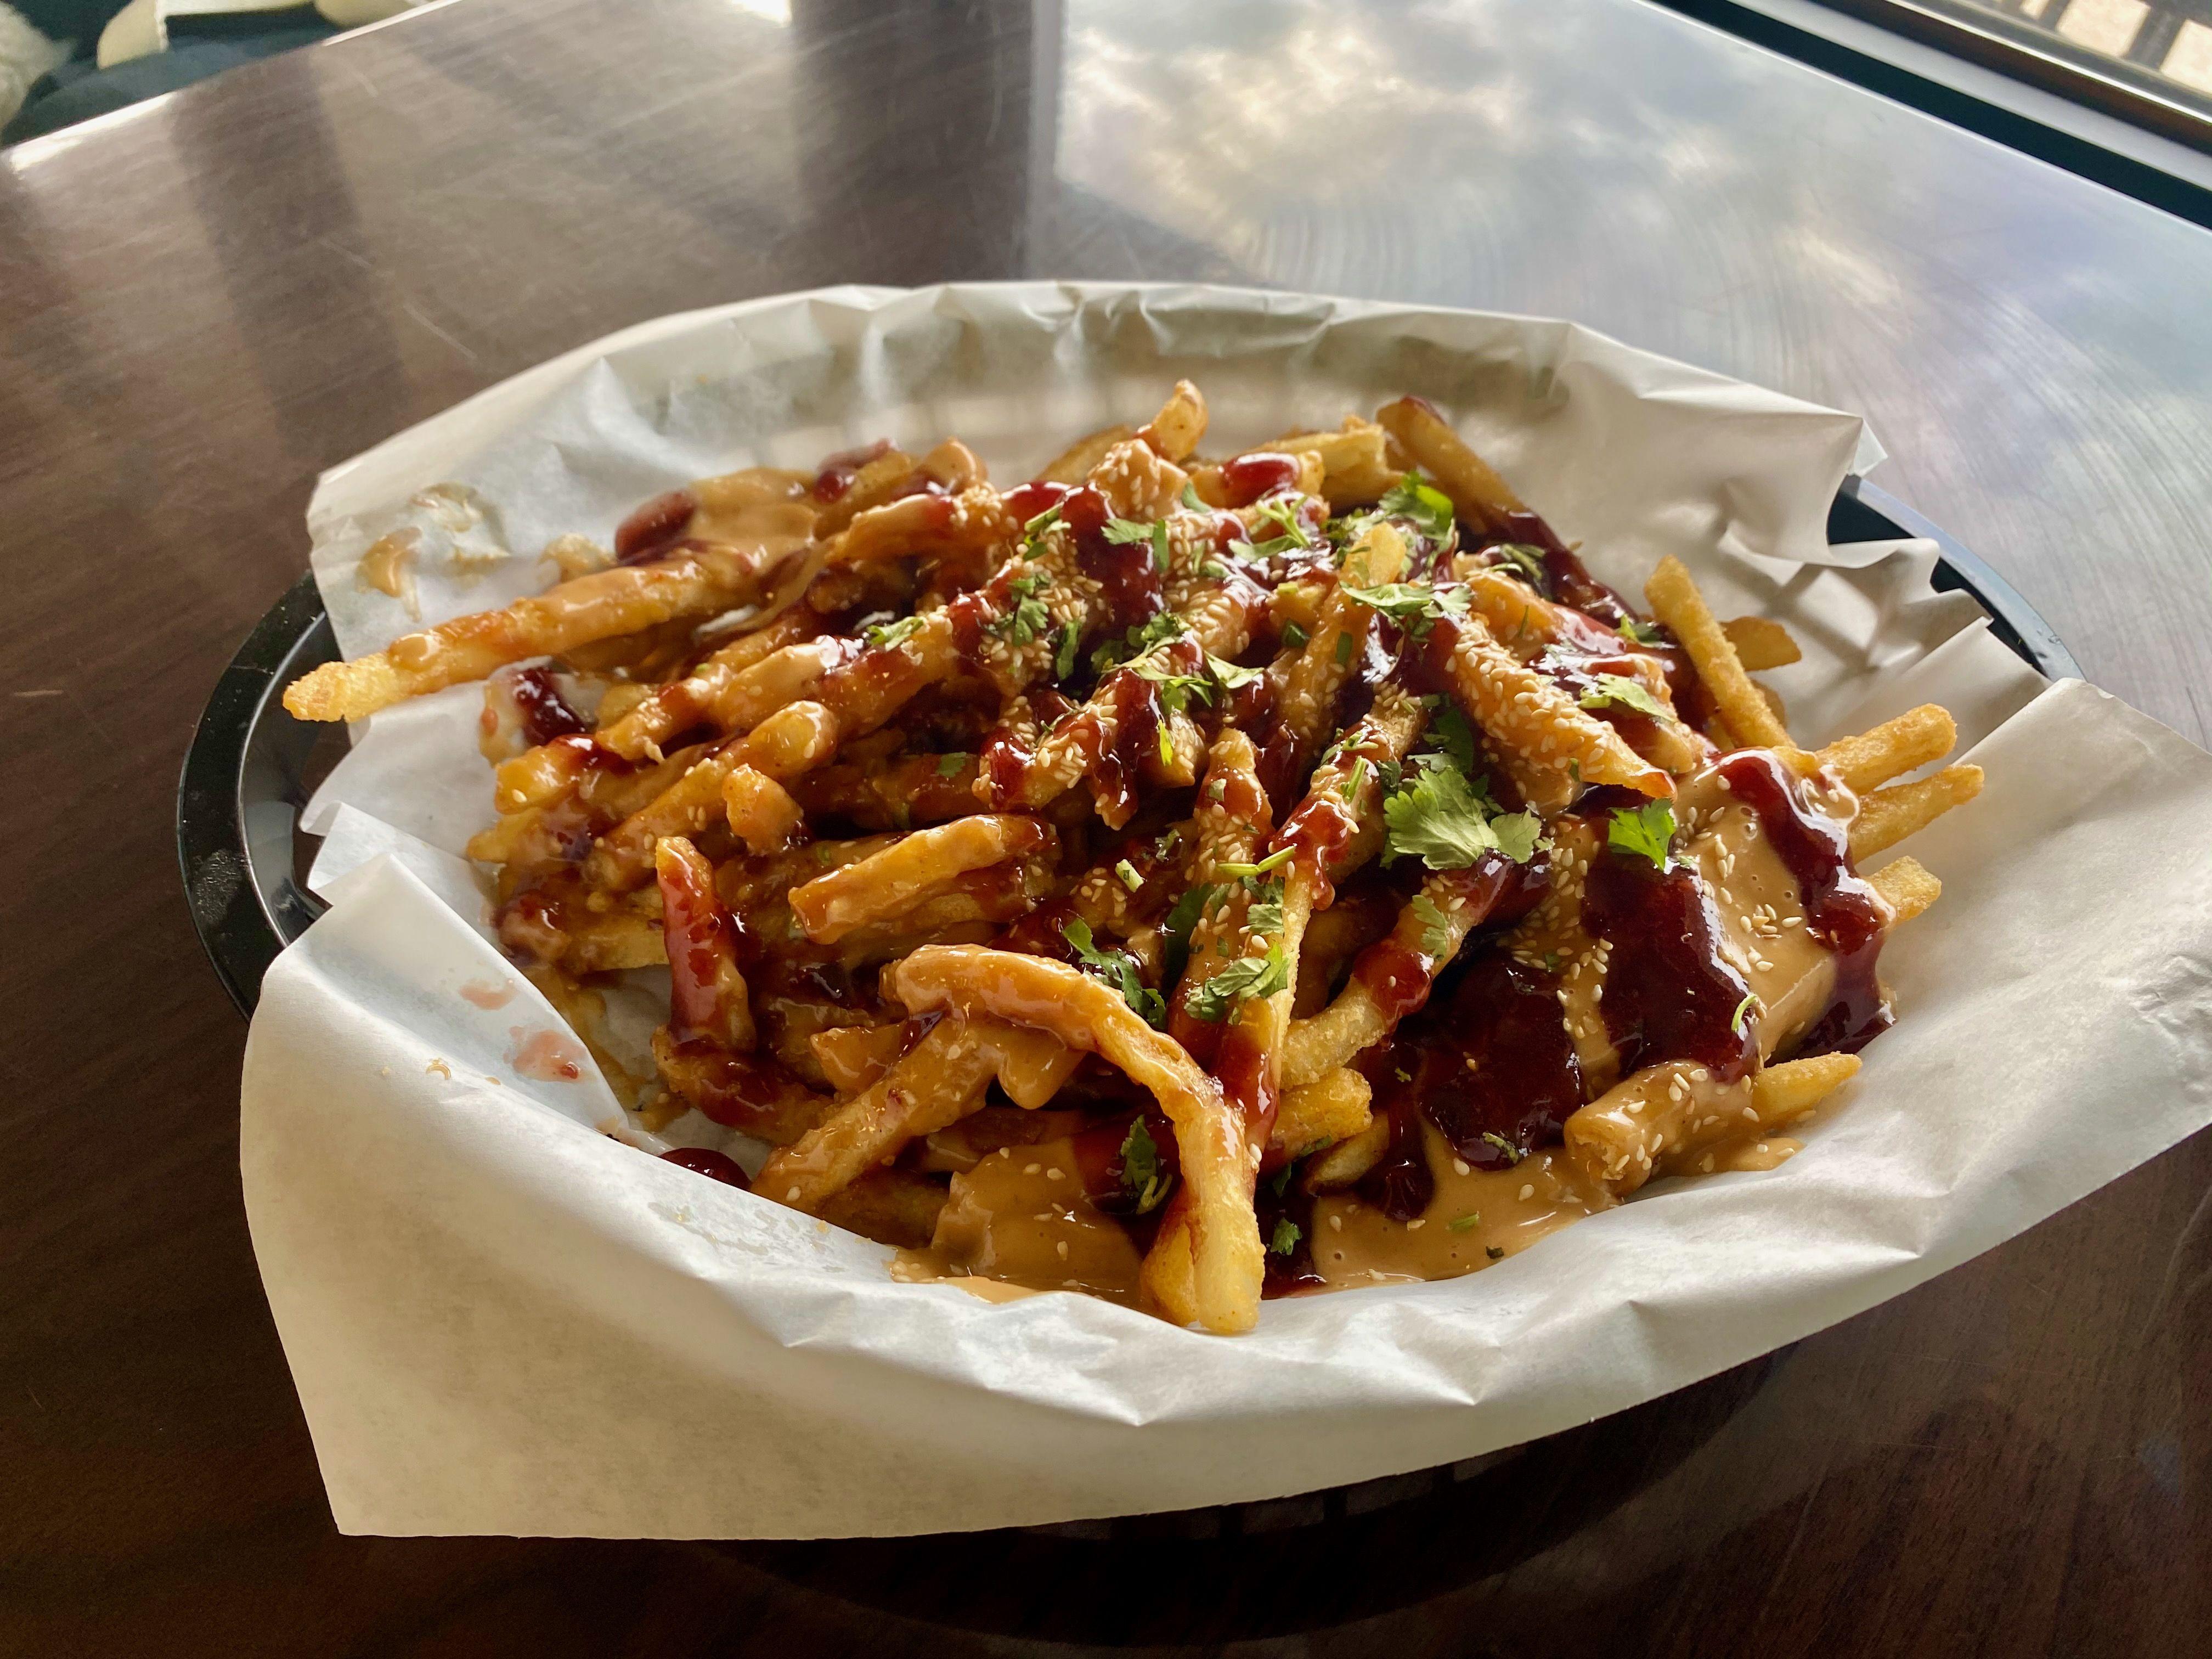 PB&J Fries from Curbin' Cuisine in Des Moines. Photo: Linh Ta/Axios